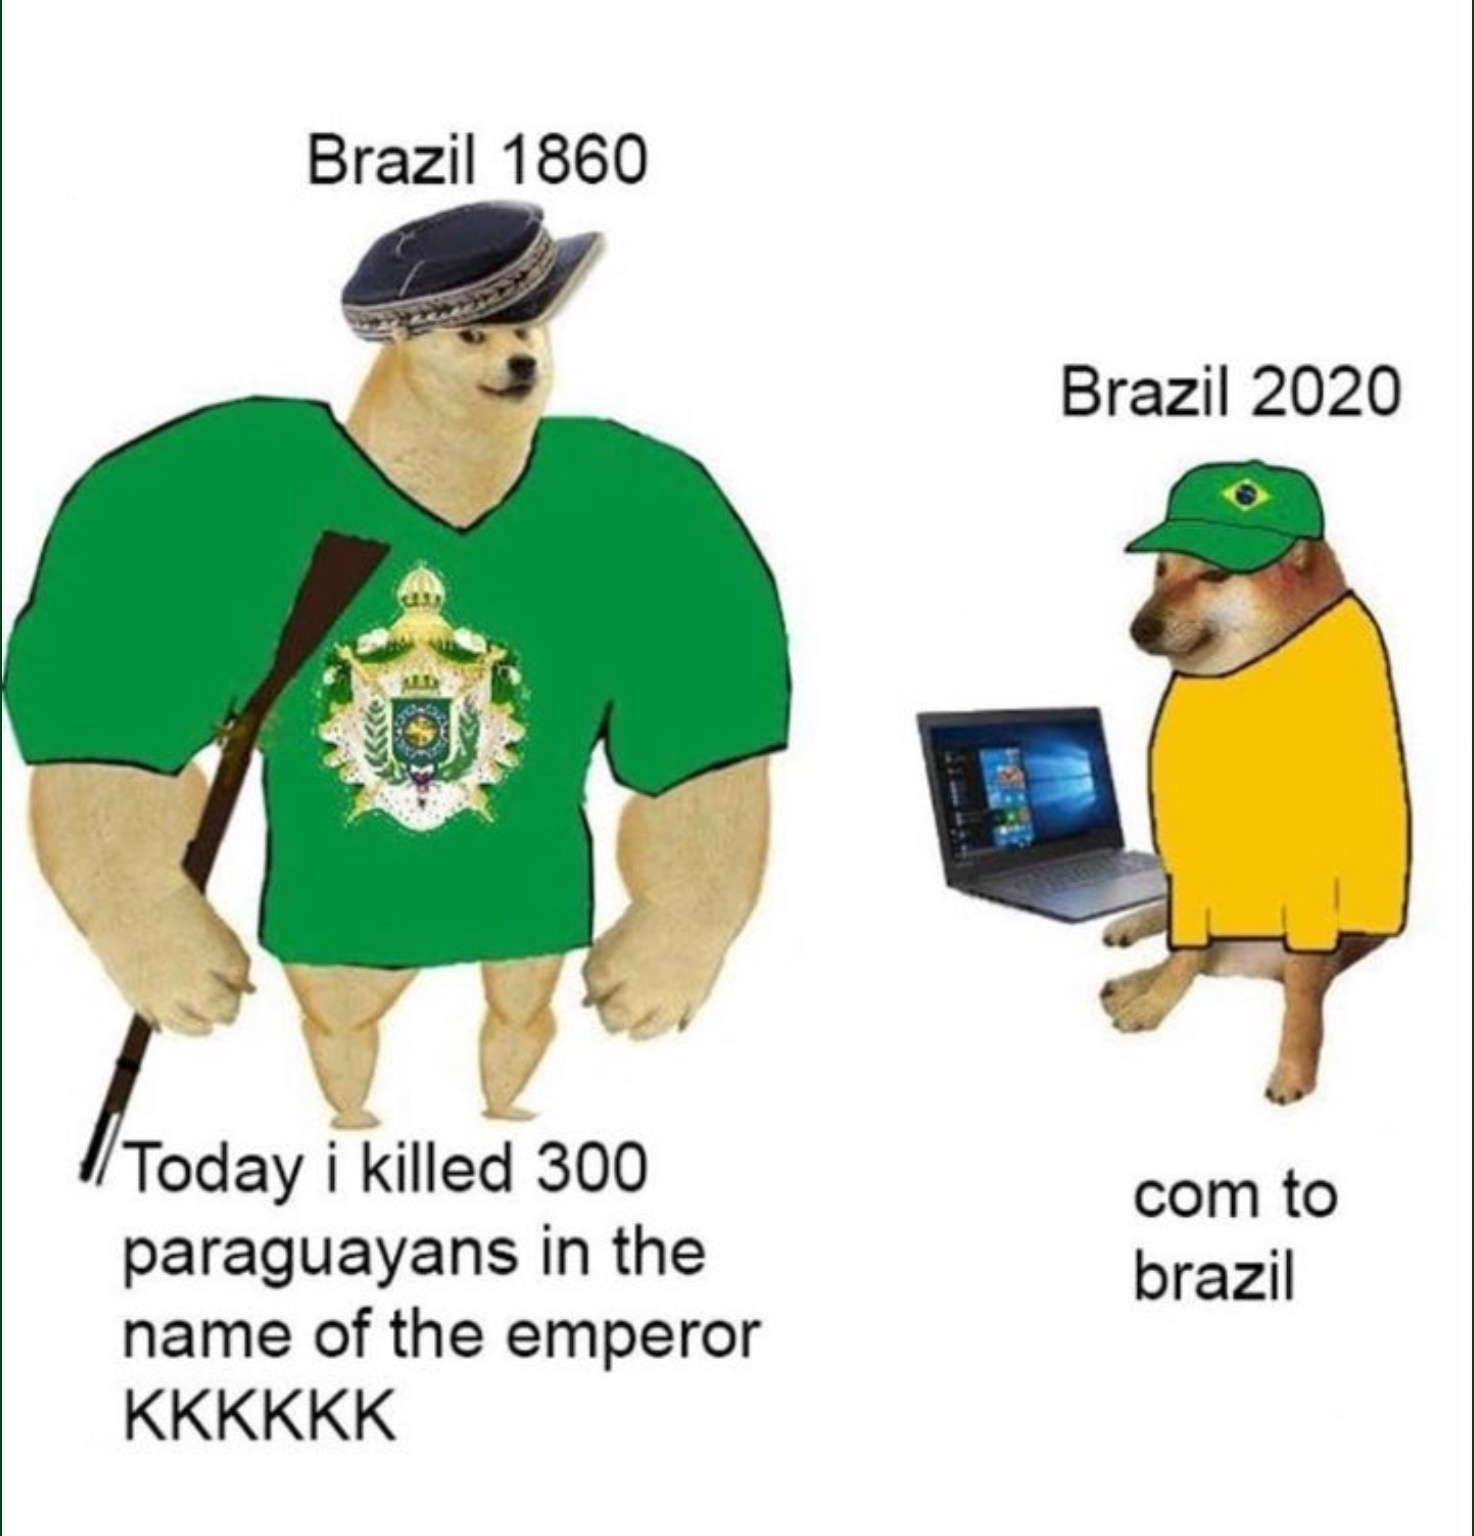 come to brazil vadia puta - meme